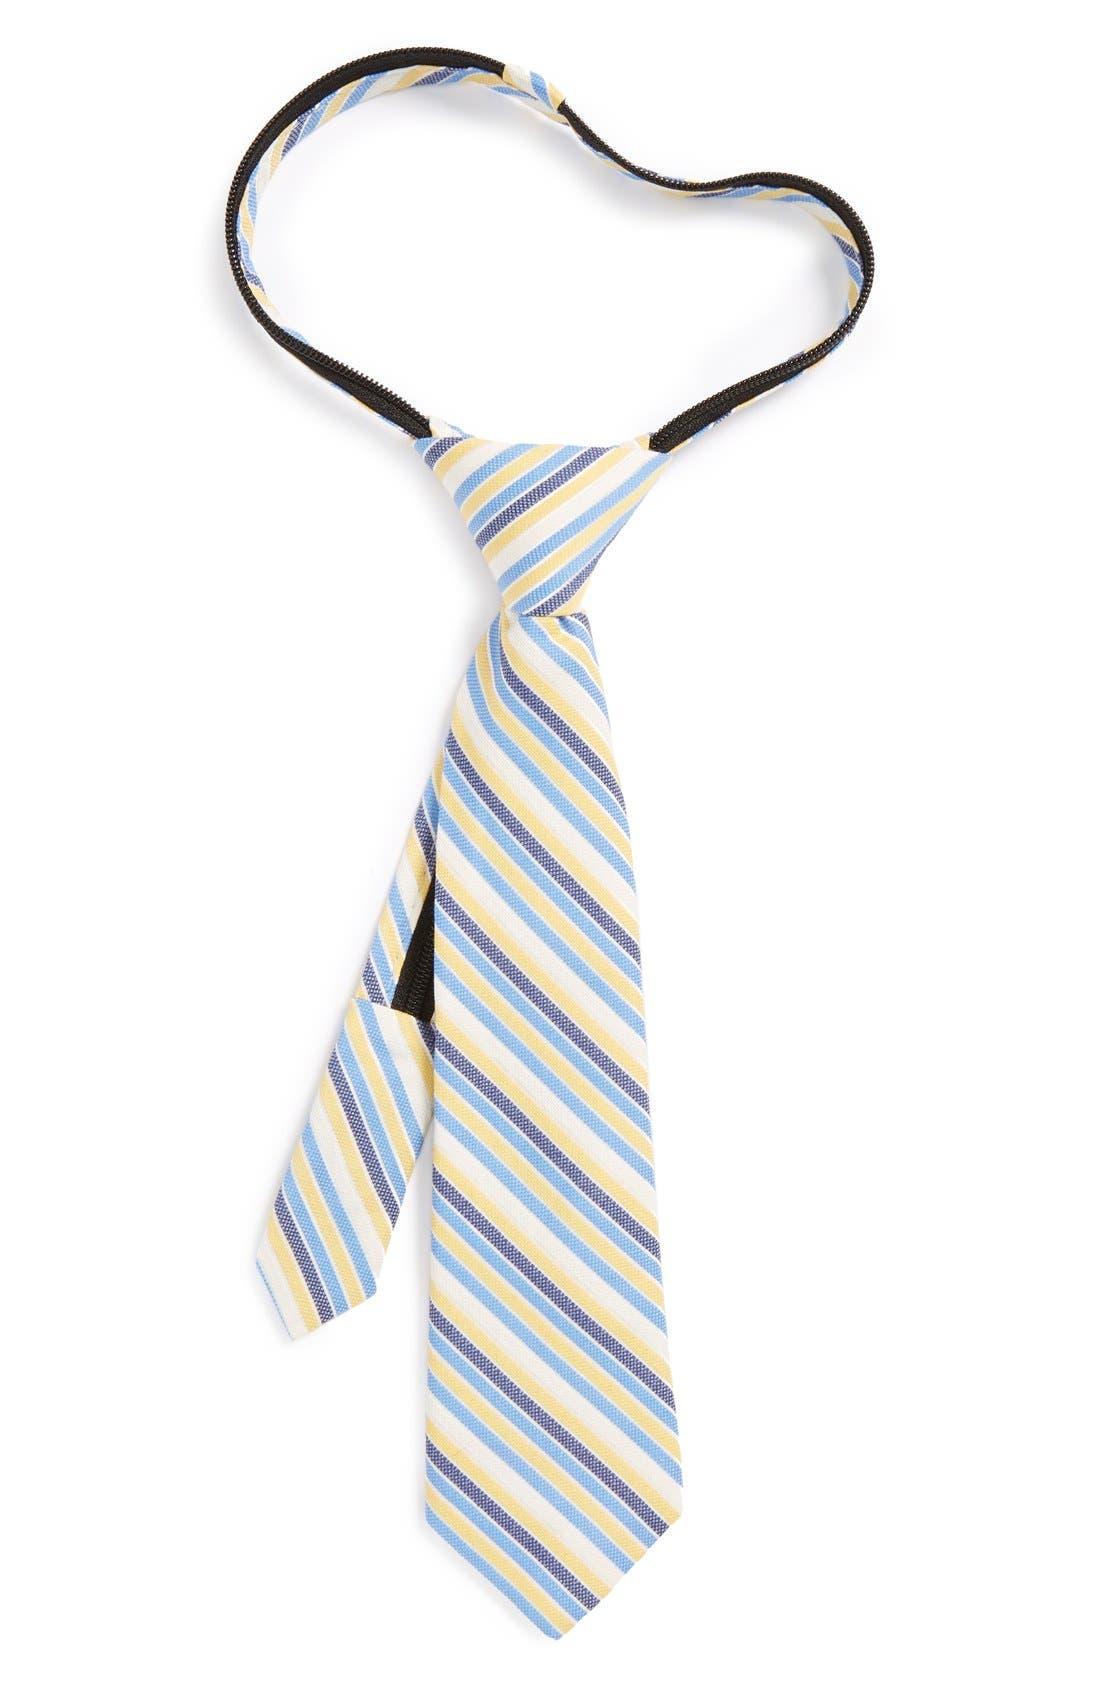 Main Image - Nordstrom Cotton & Silk Zipper Tie (Little Boys)